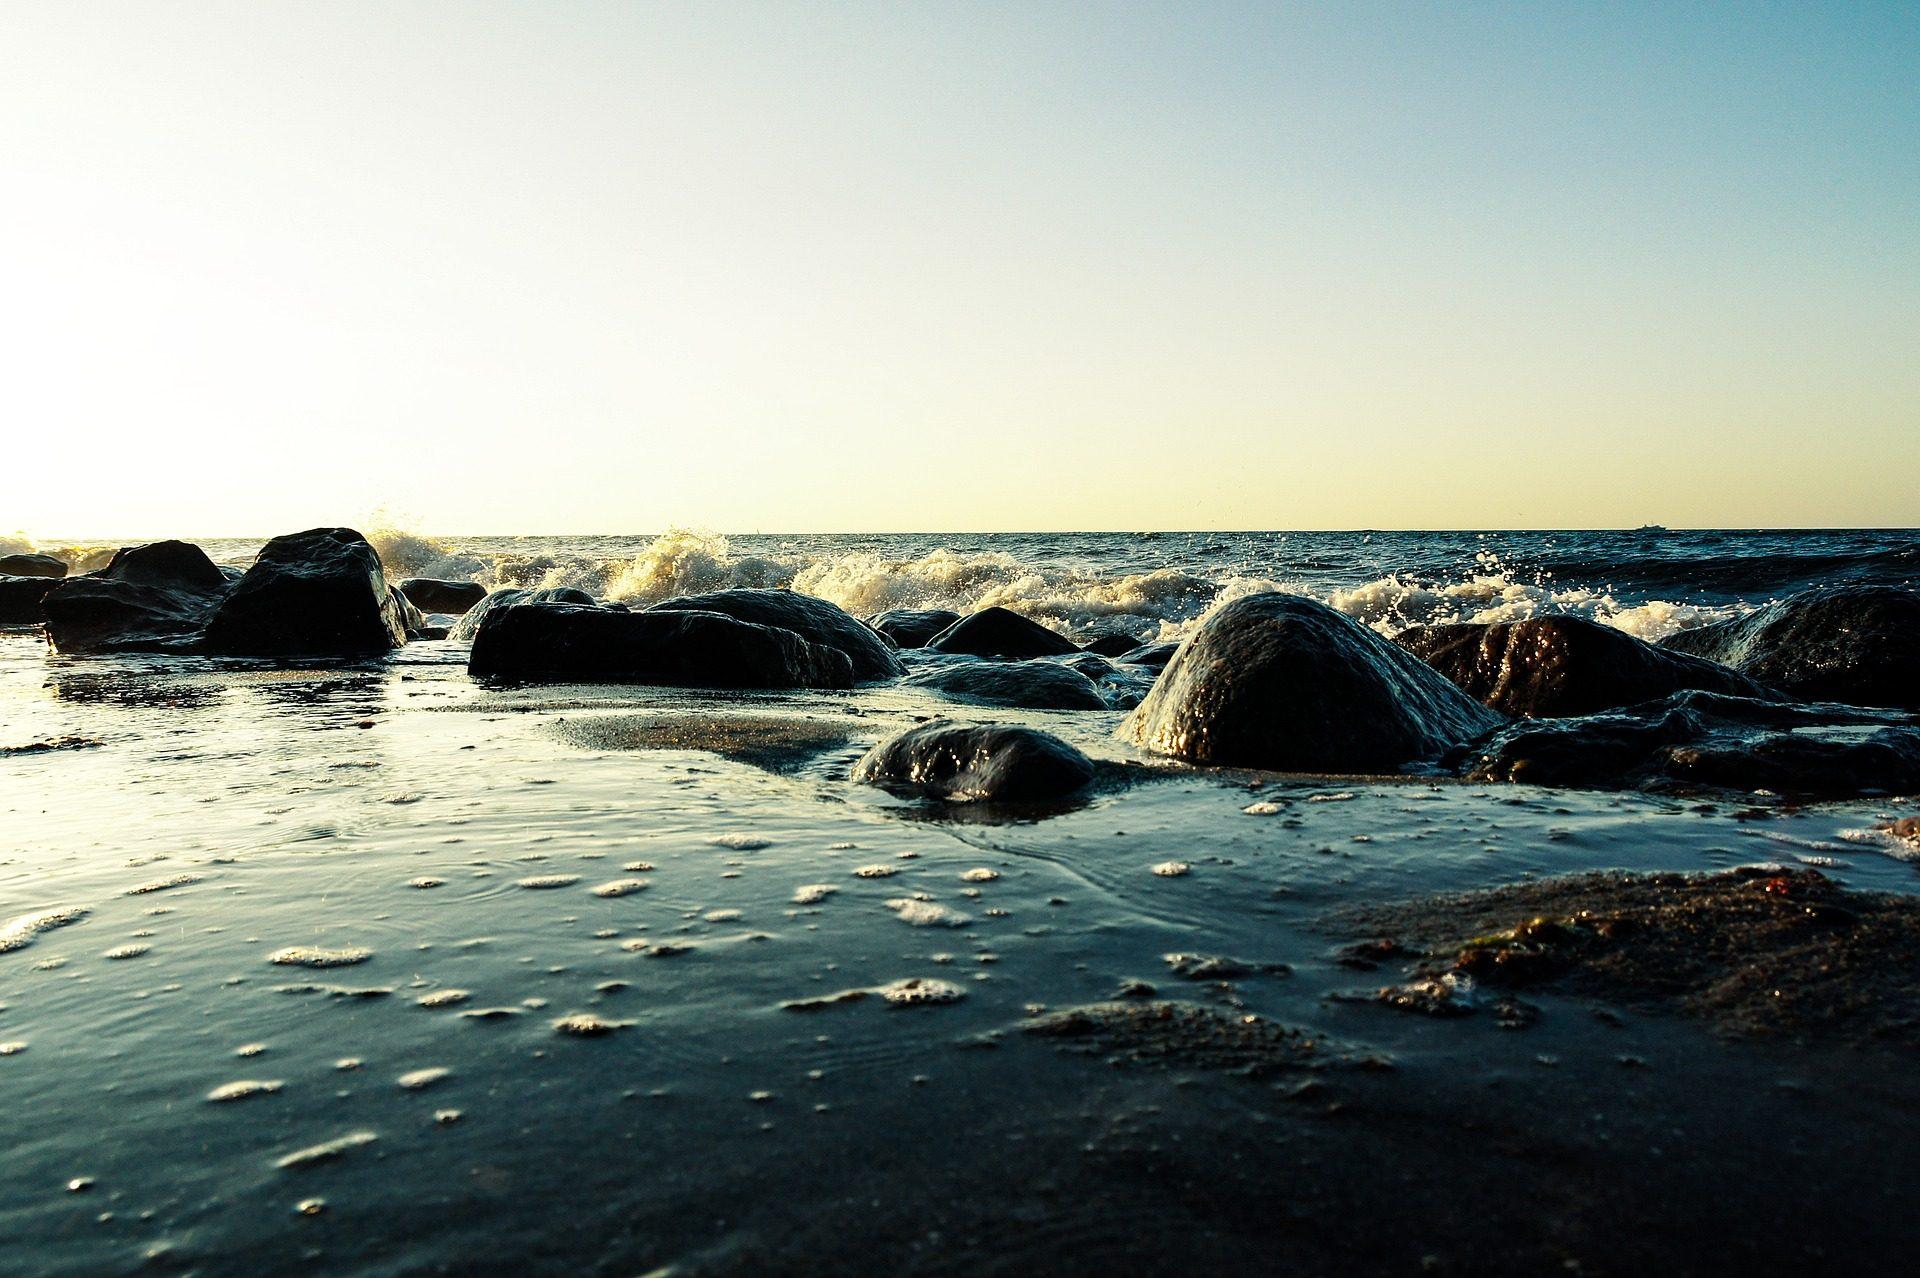 mar, océano, piedras, rocas, agua, olas - Fondos de Pantalla HD - professor-falken.com